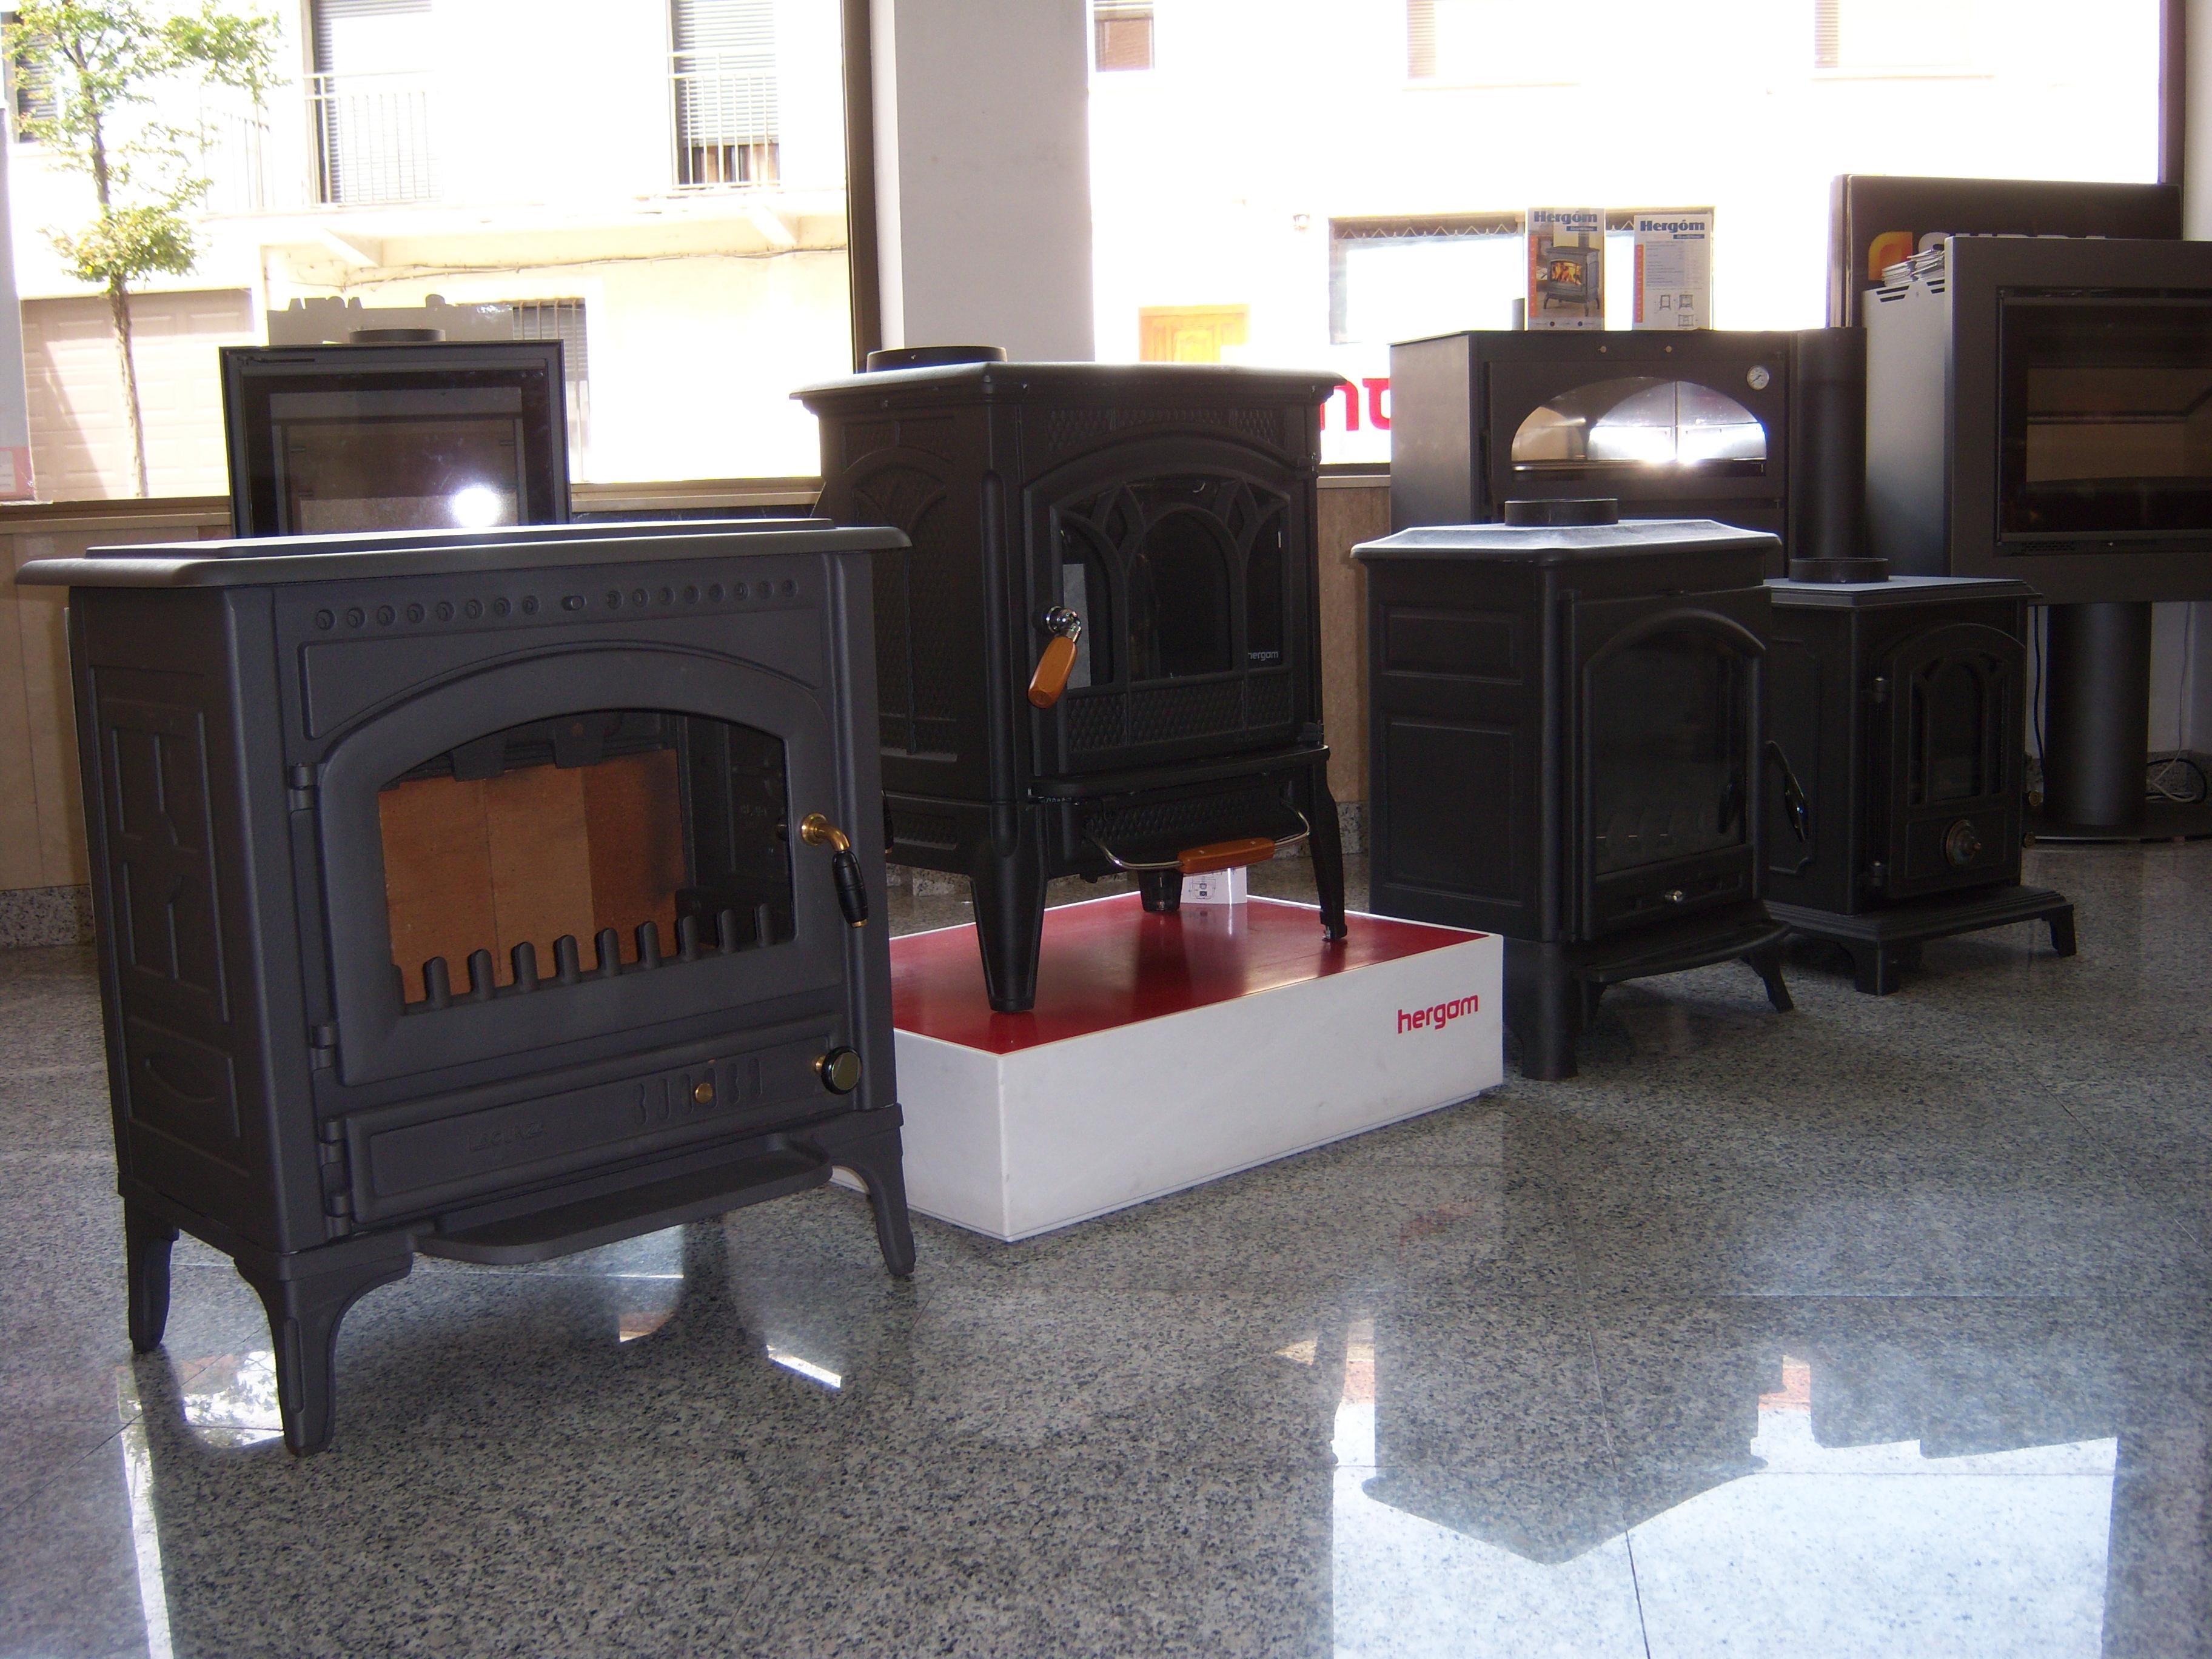 Estufas meco chimeneas molina venta e instalaci n de - Estufa de pellets y lena ...